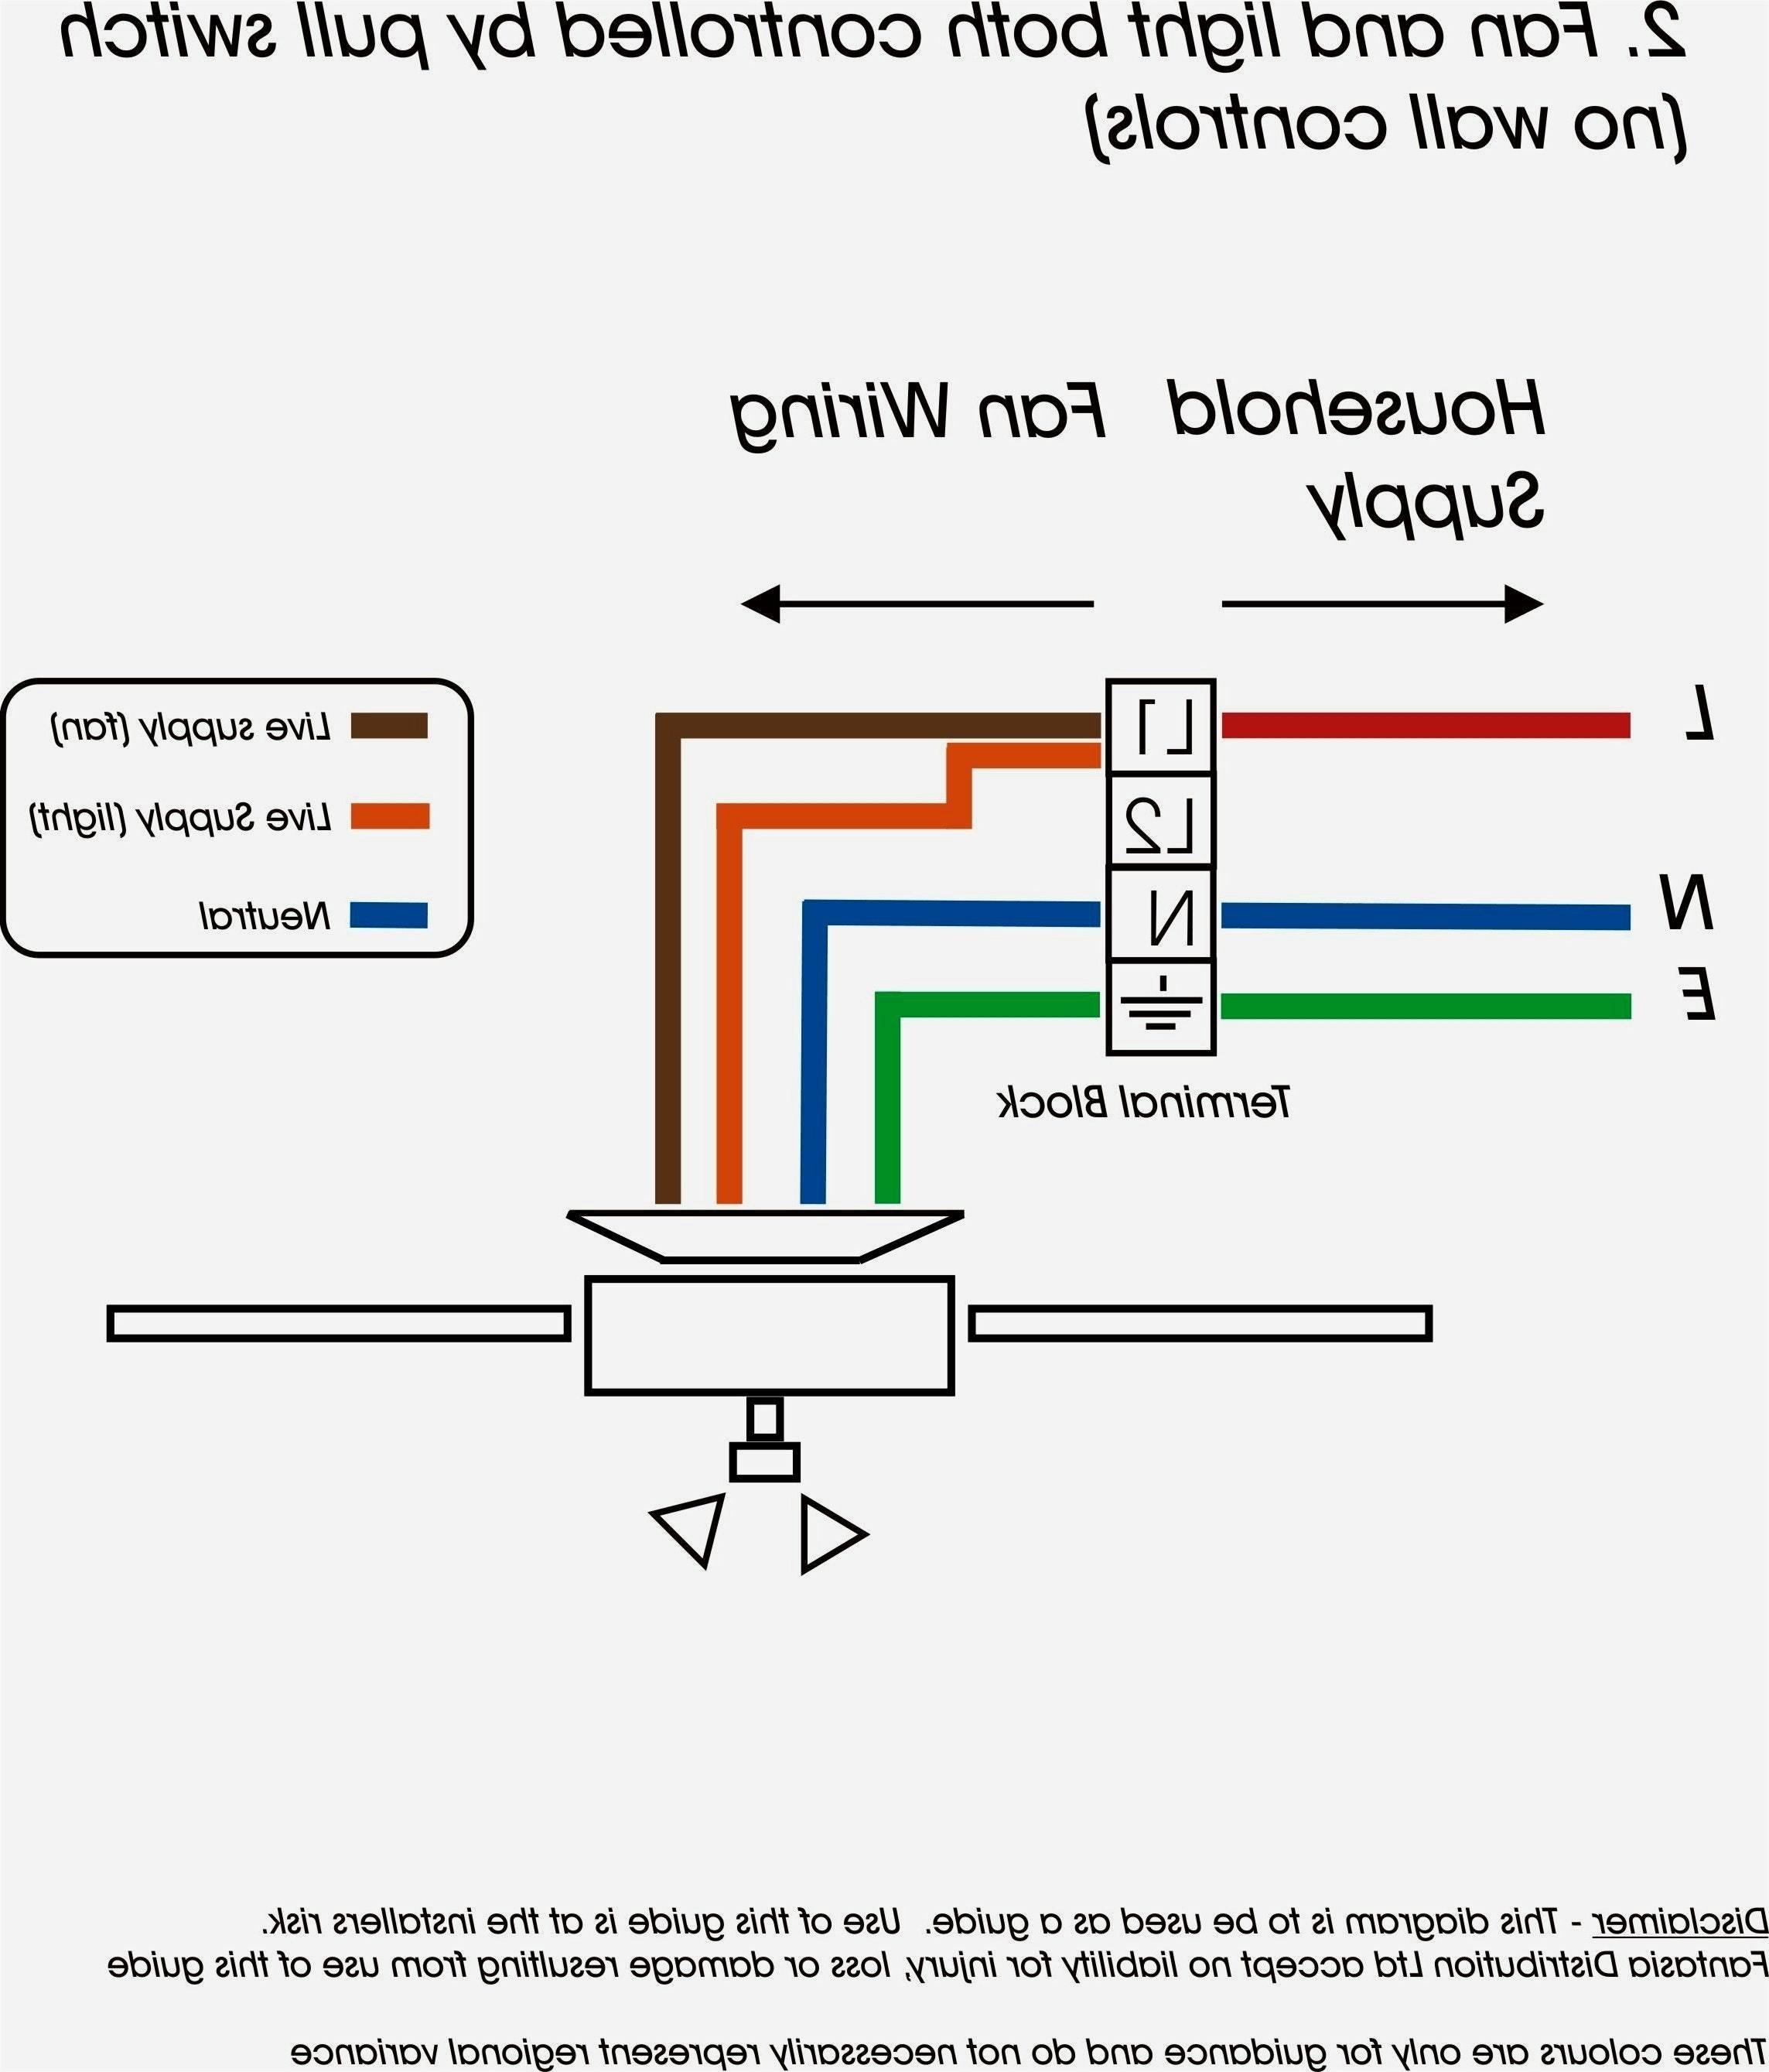 hk42fz011 wiring diagram Collection-Hk42fz009 Wiring Diagram Gallery 13-r